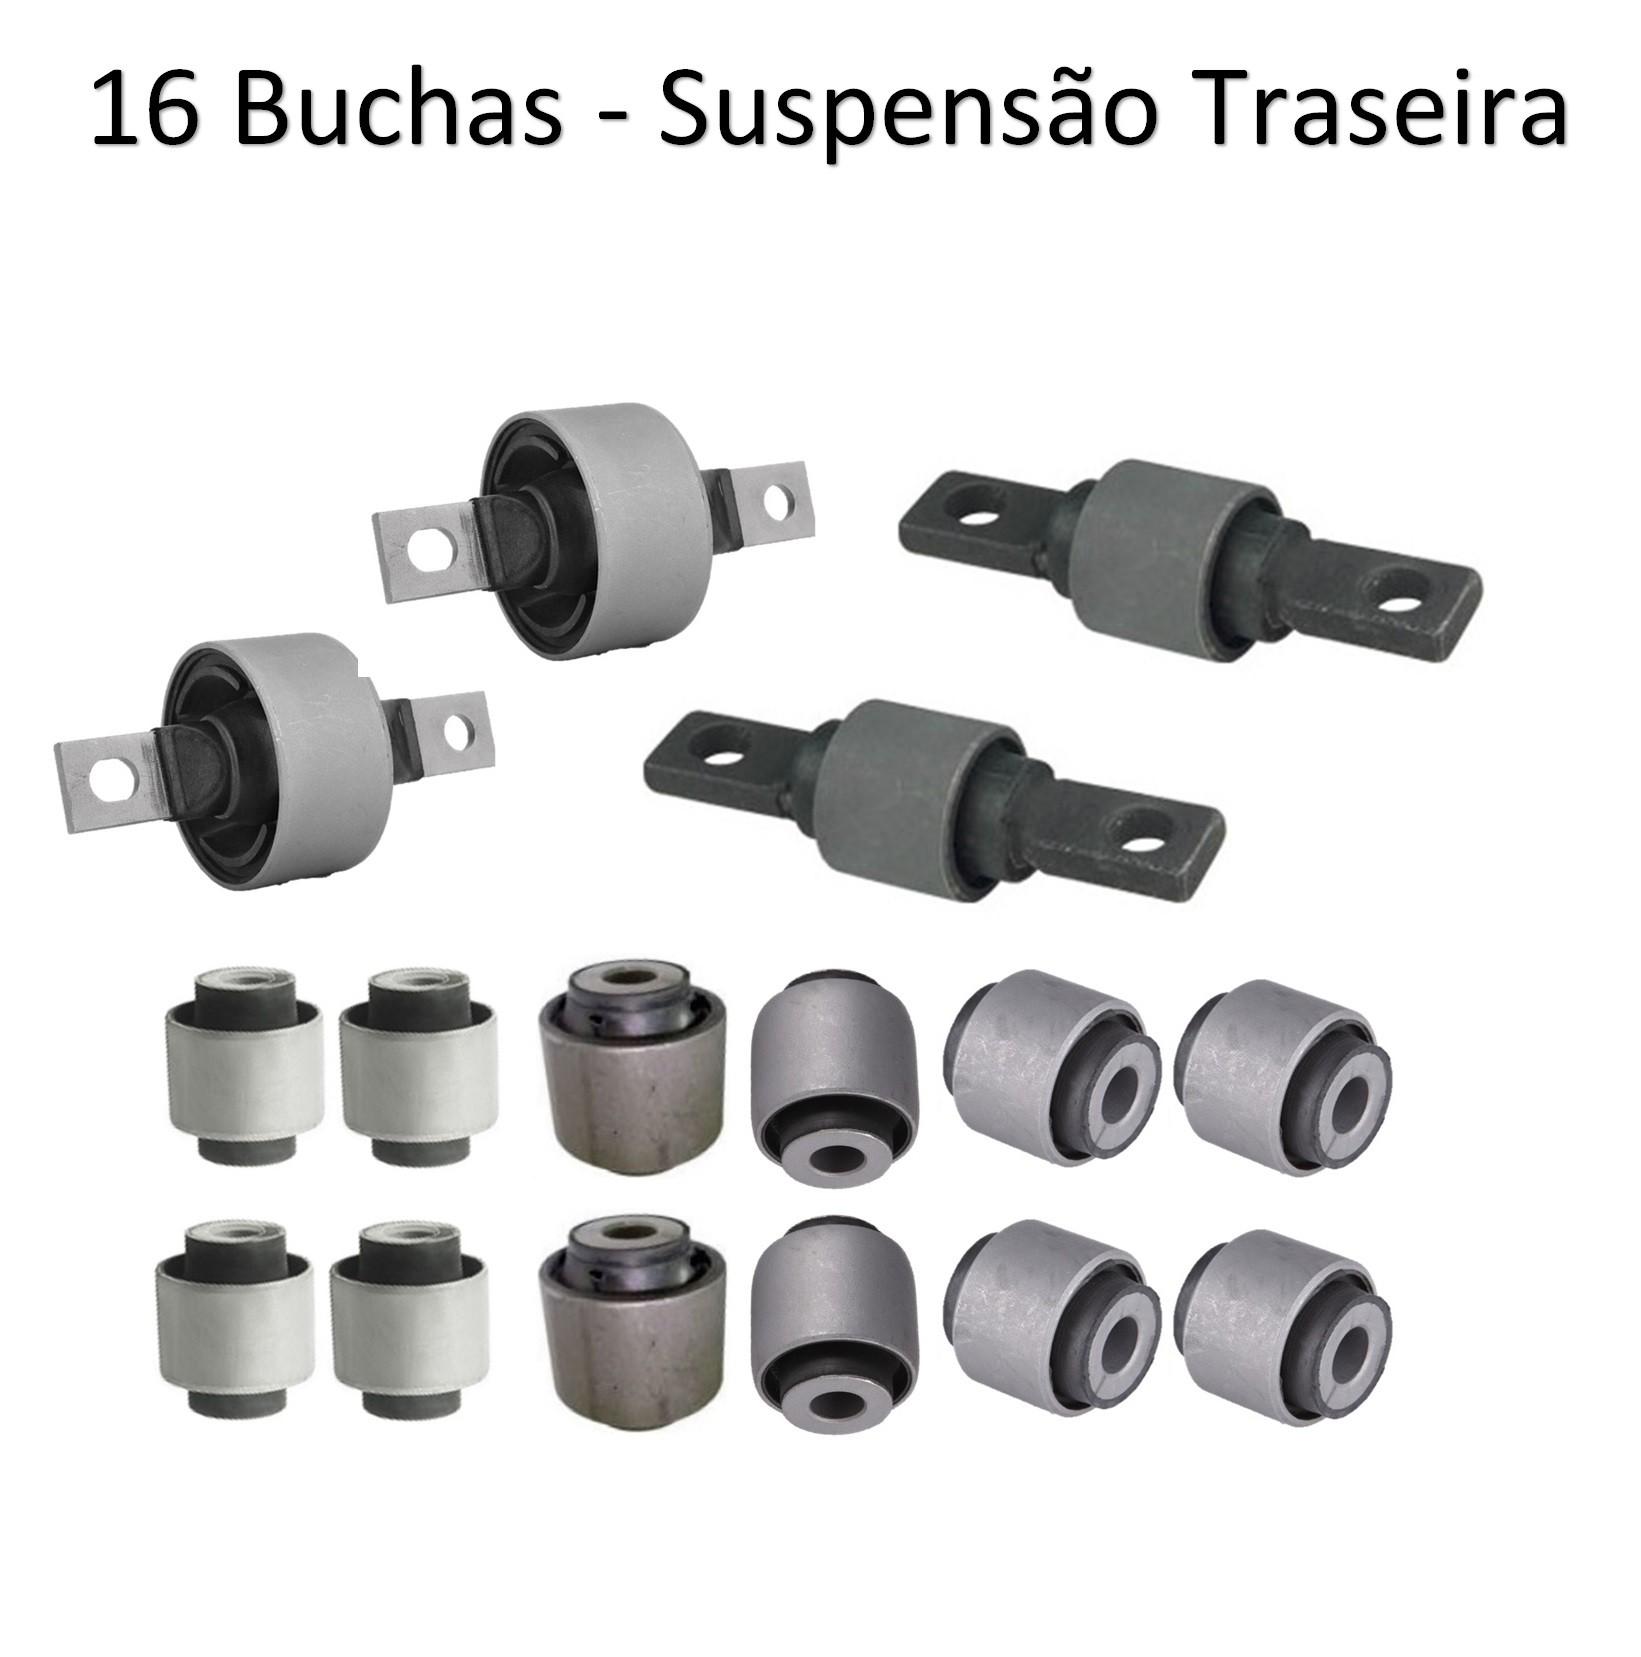 Kit Buchas Suspensão Traseira Civic 1996 1997 1998 1999 2000